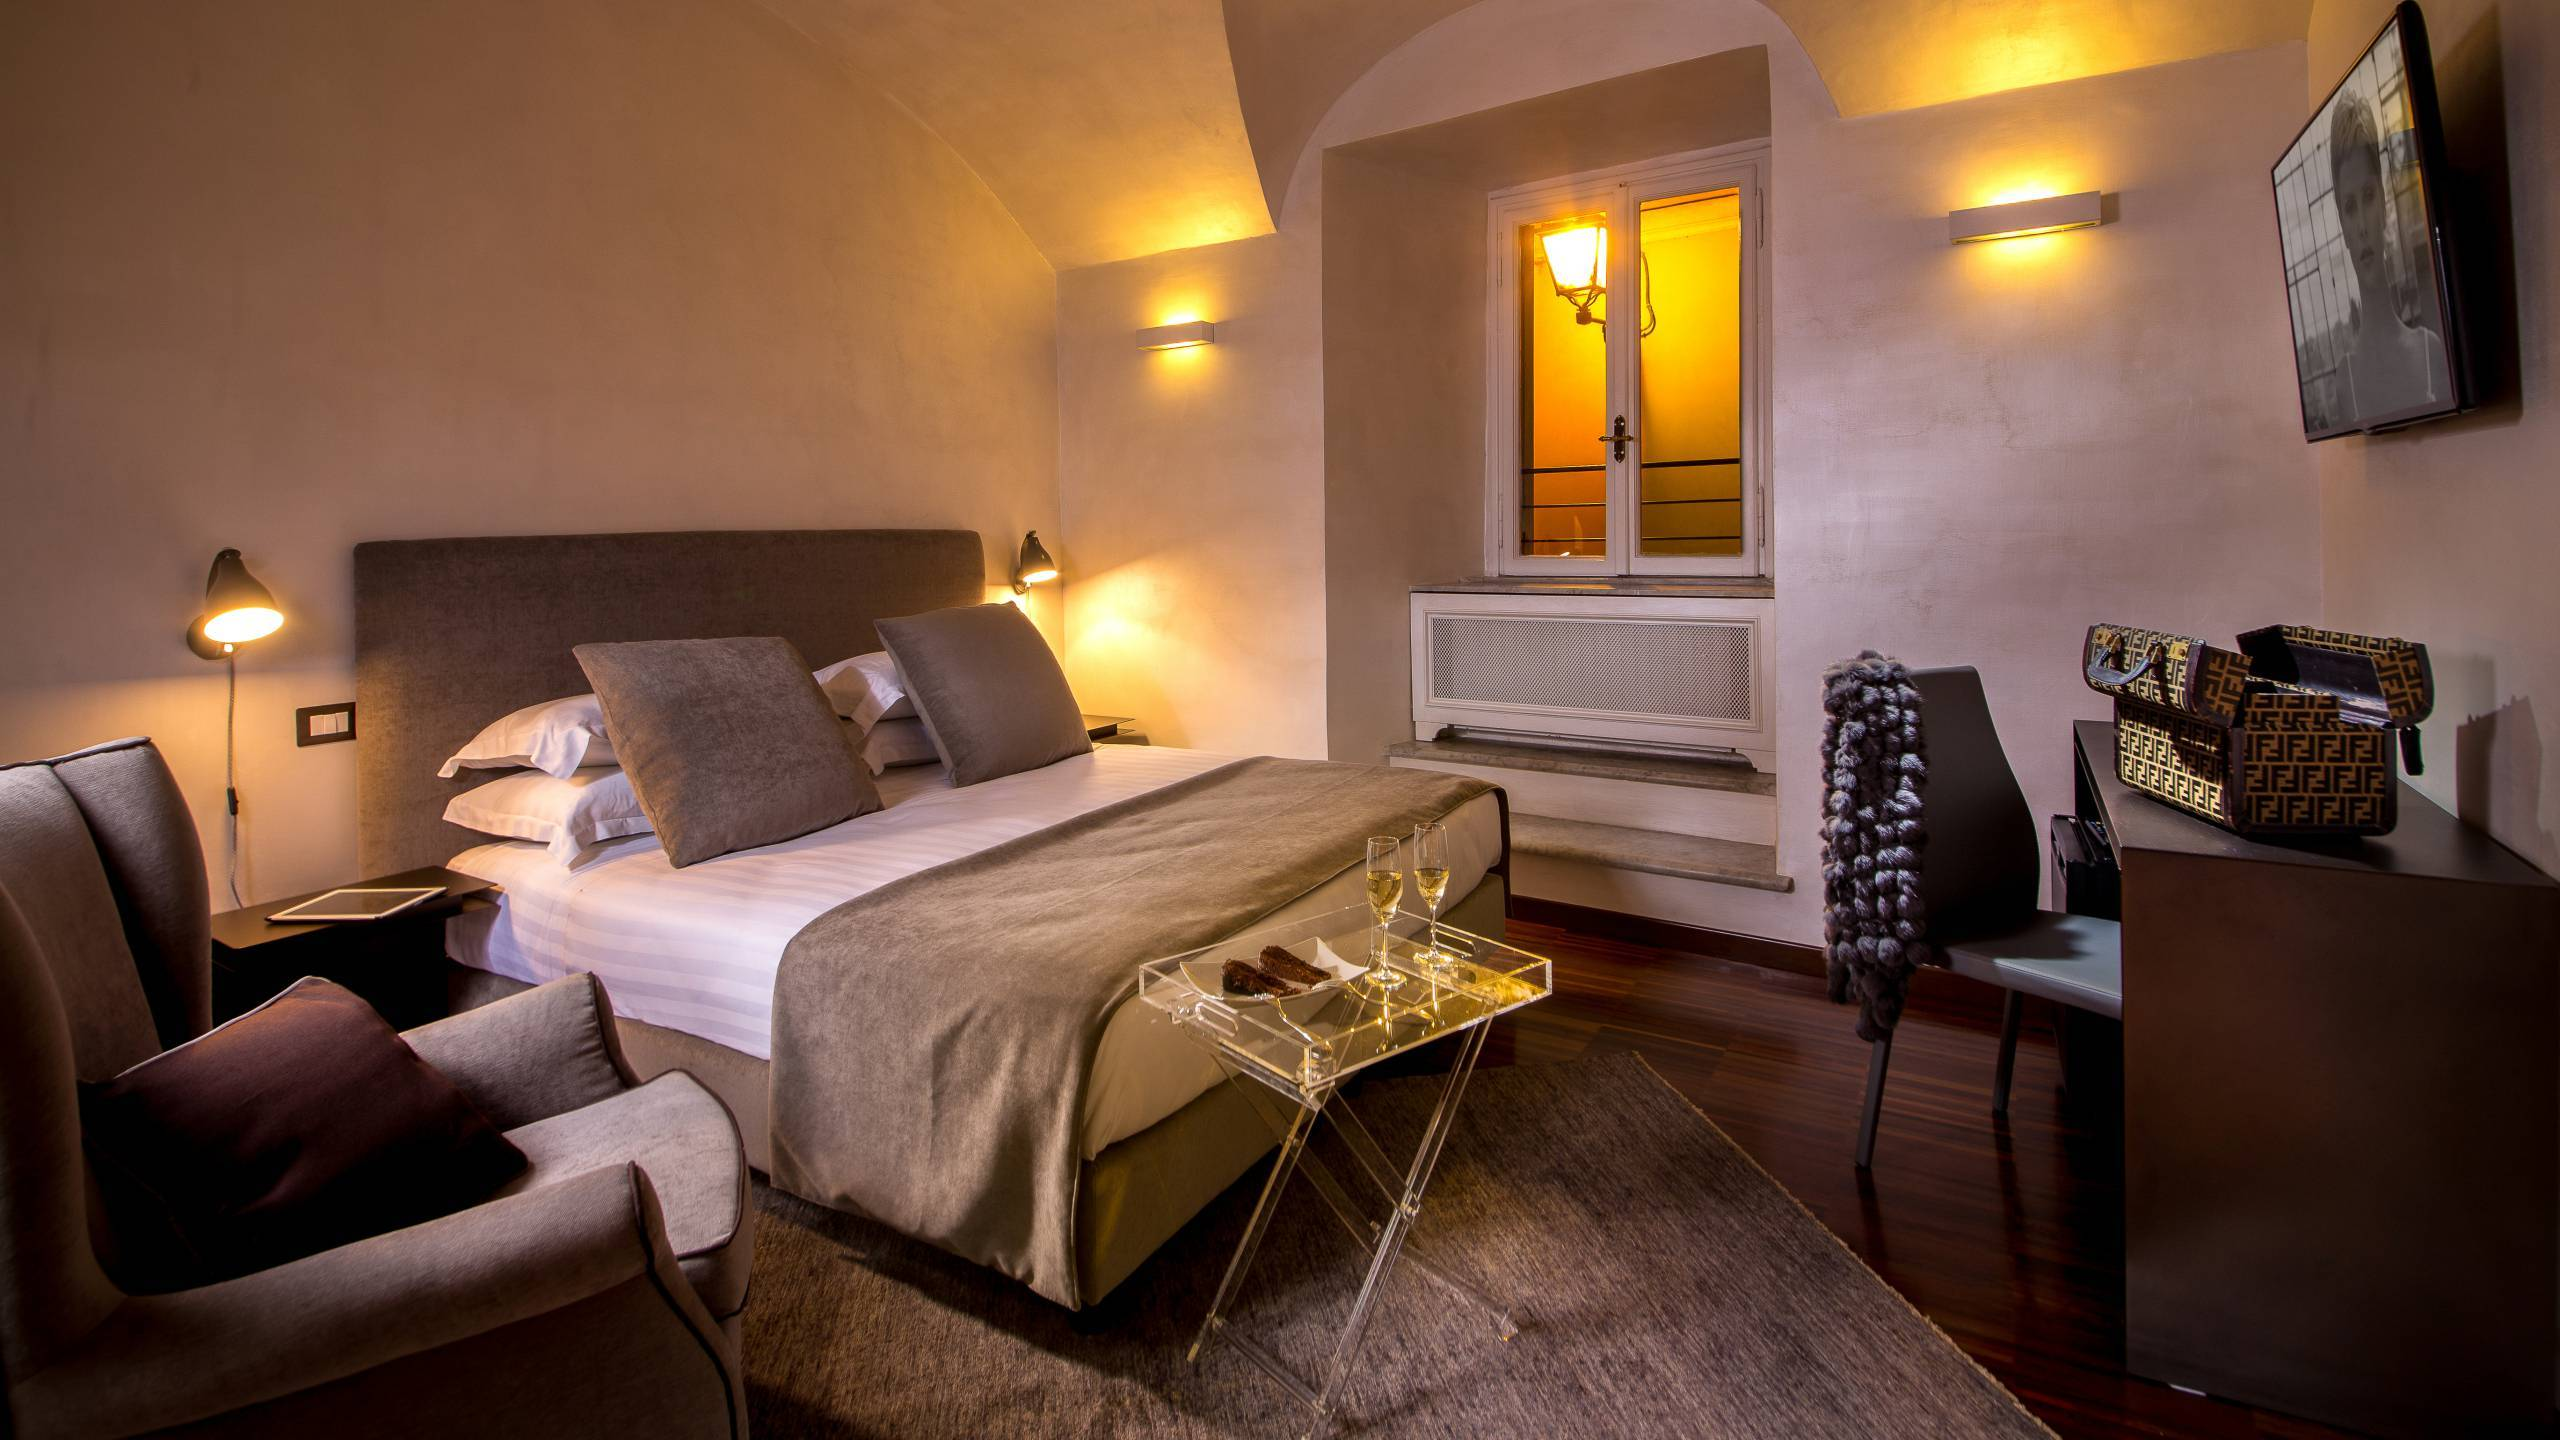 palazzo-de-cupis-roma-suite6